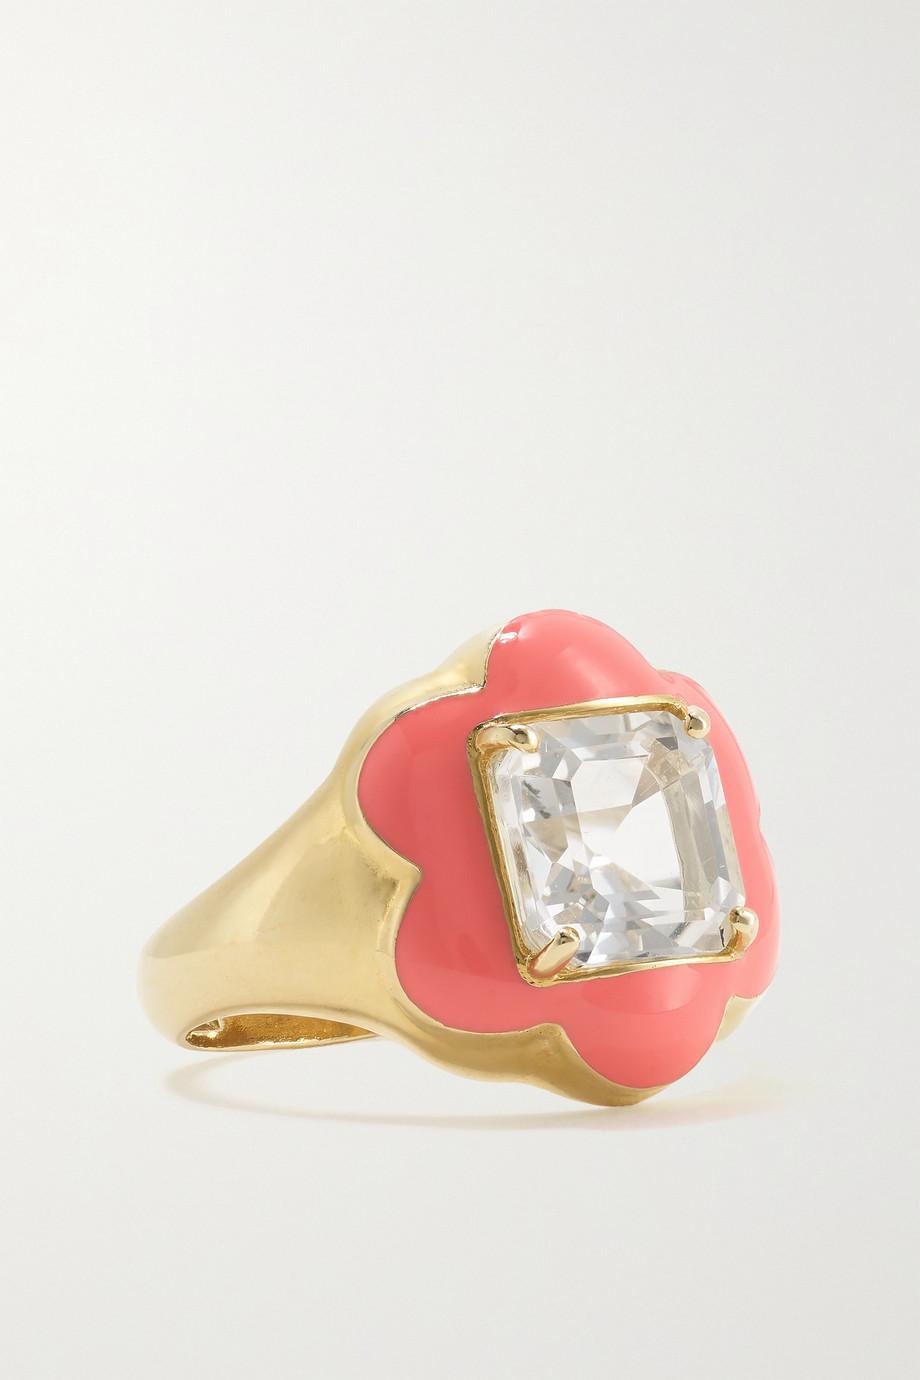 Bea Bongiasca Give Them Flowers 9-karat gold, enamel and rock crystal ring